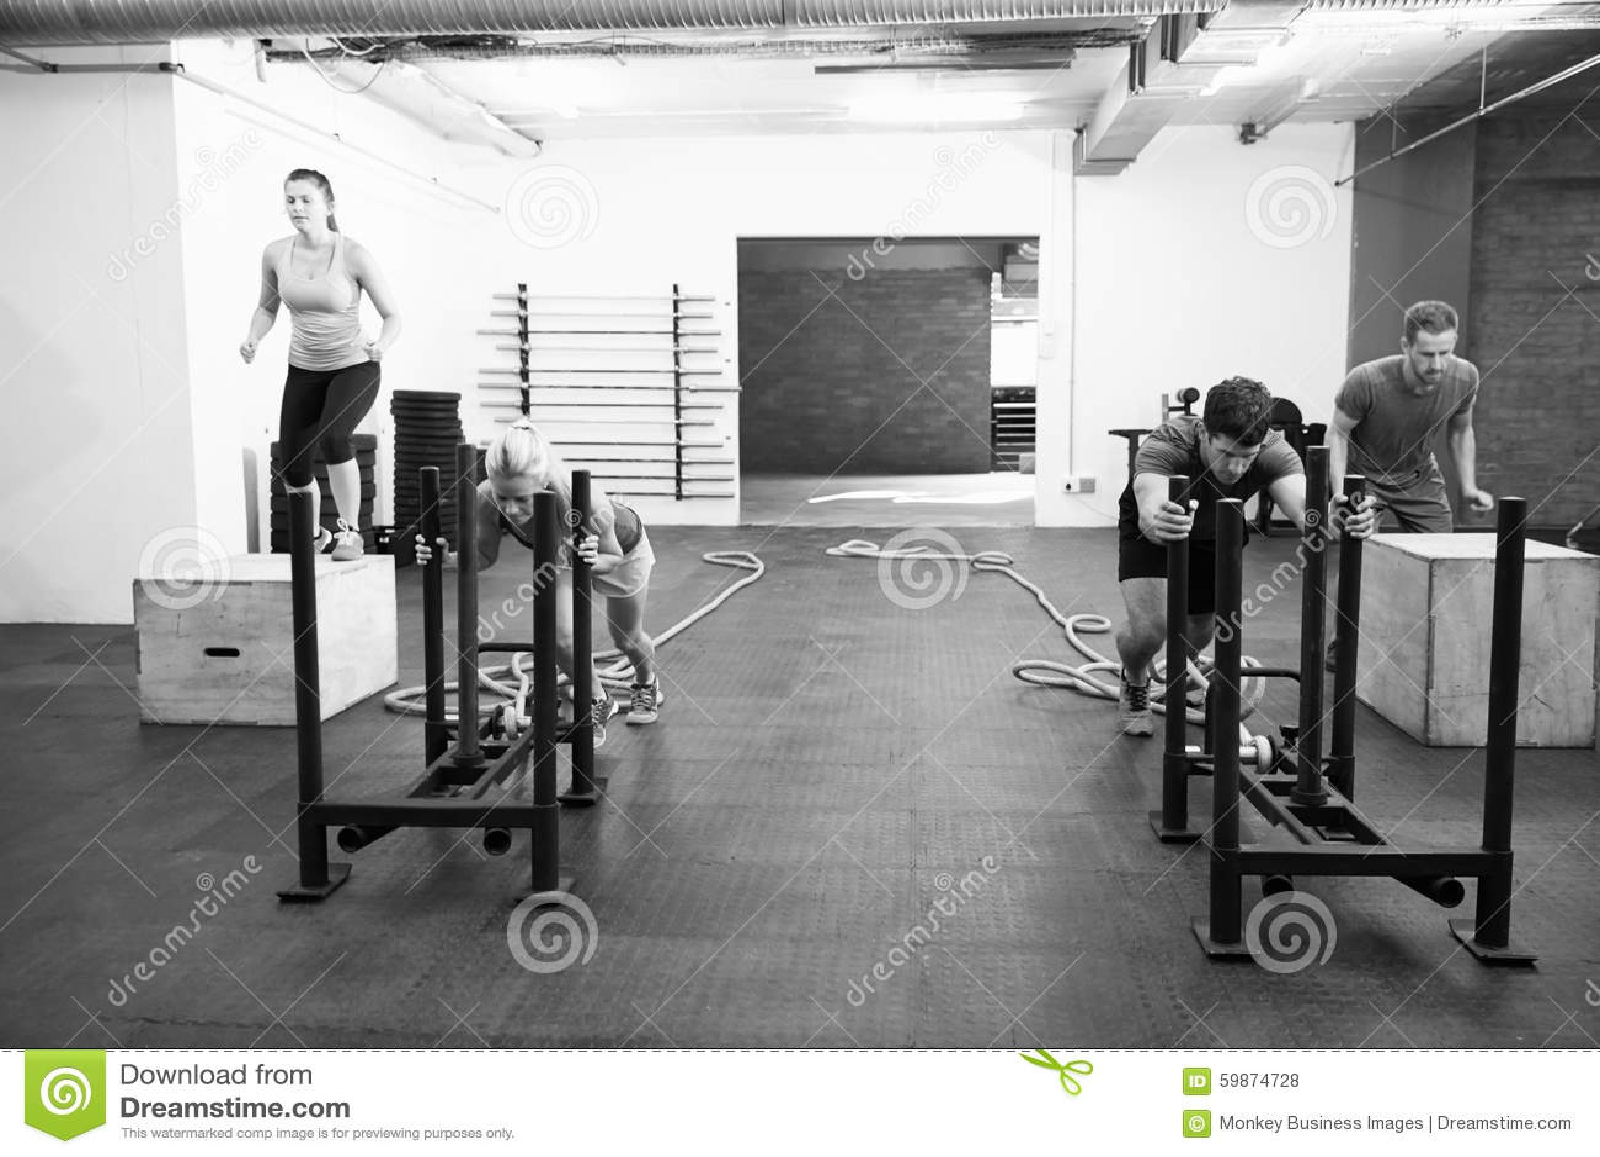 Circuito Gym : Gym boutique tnt gym boutique tnt tu primera clase gratis